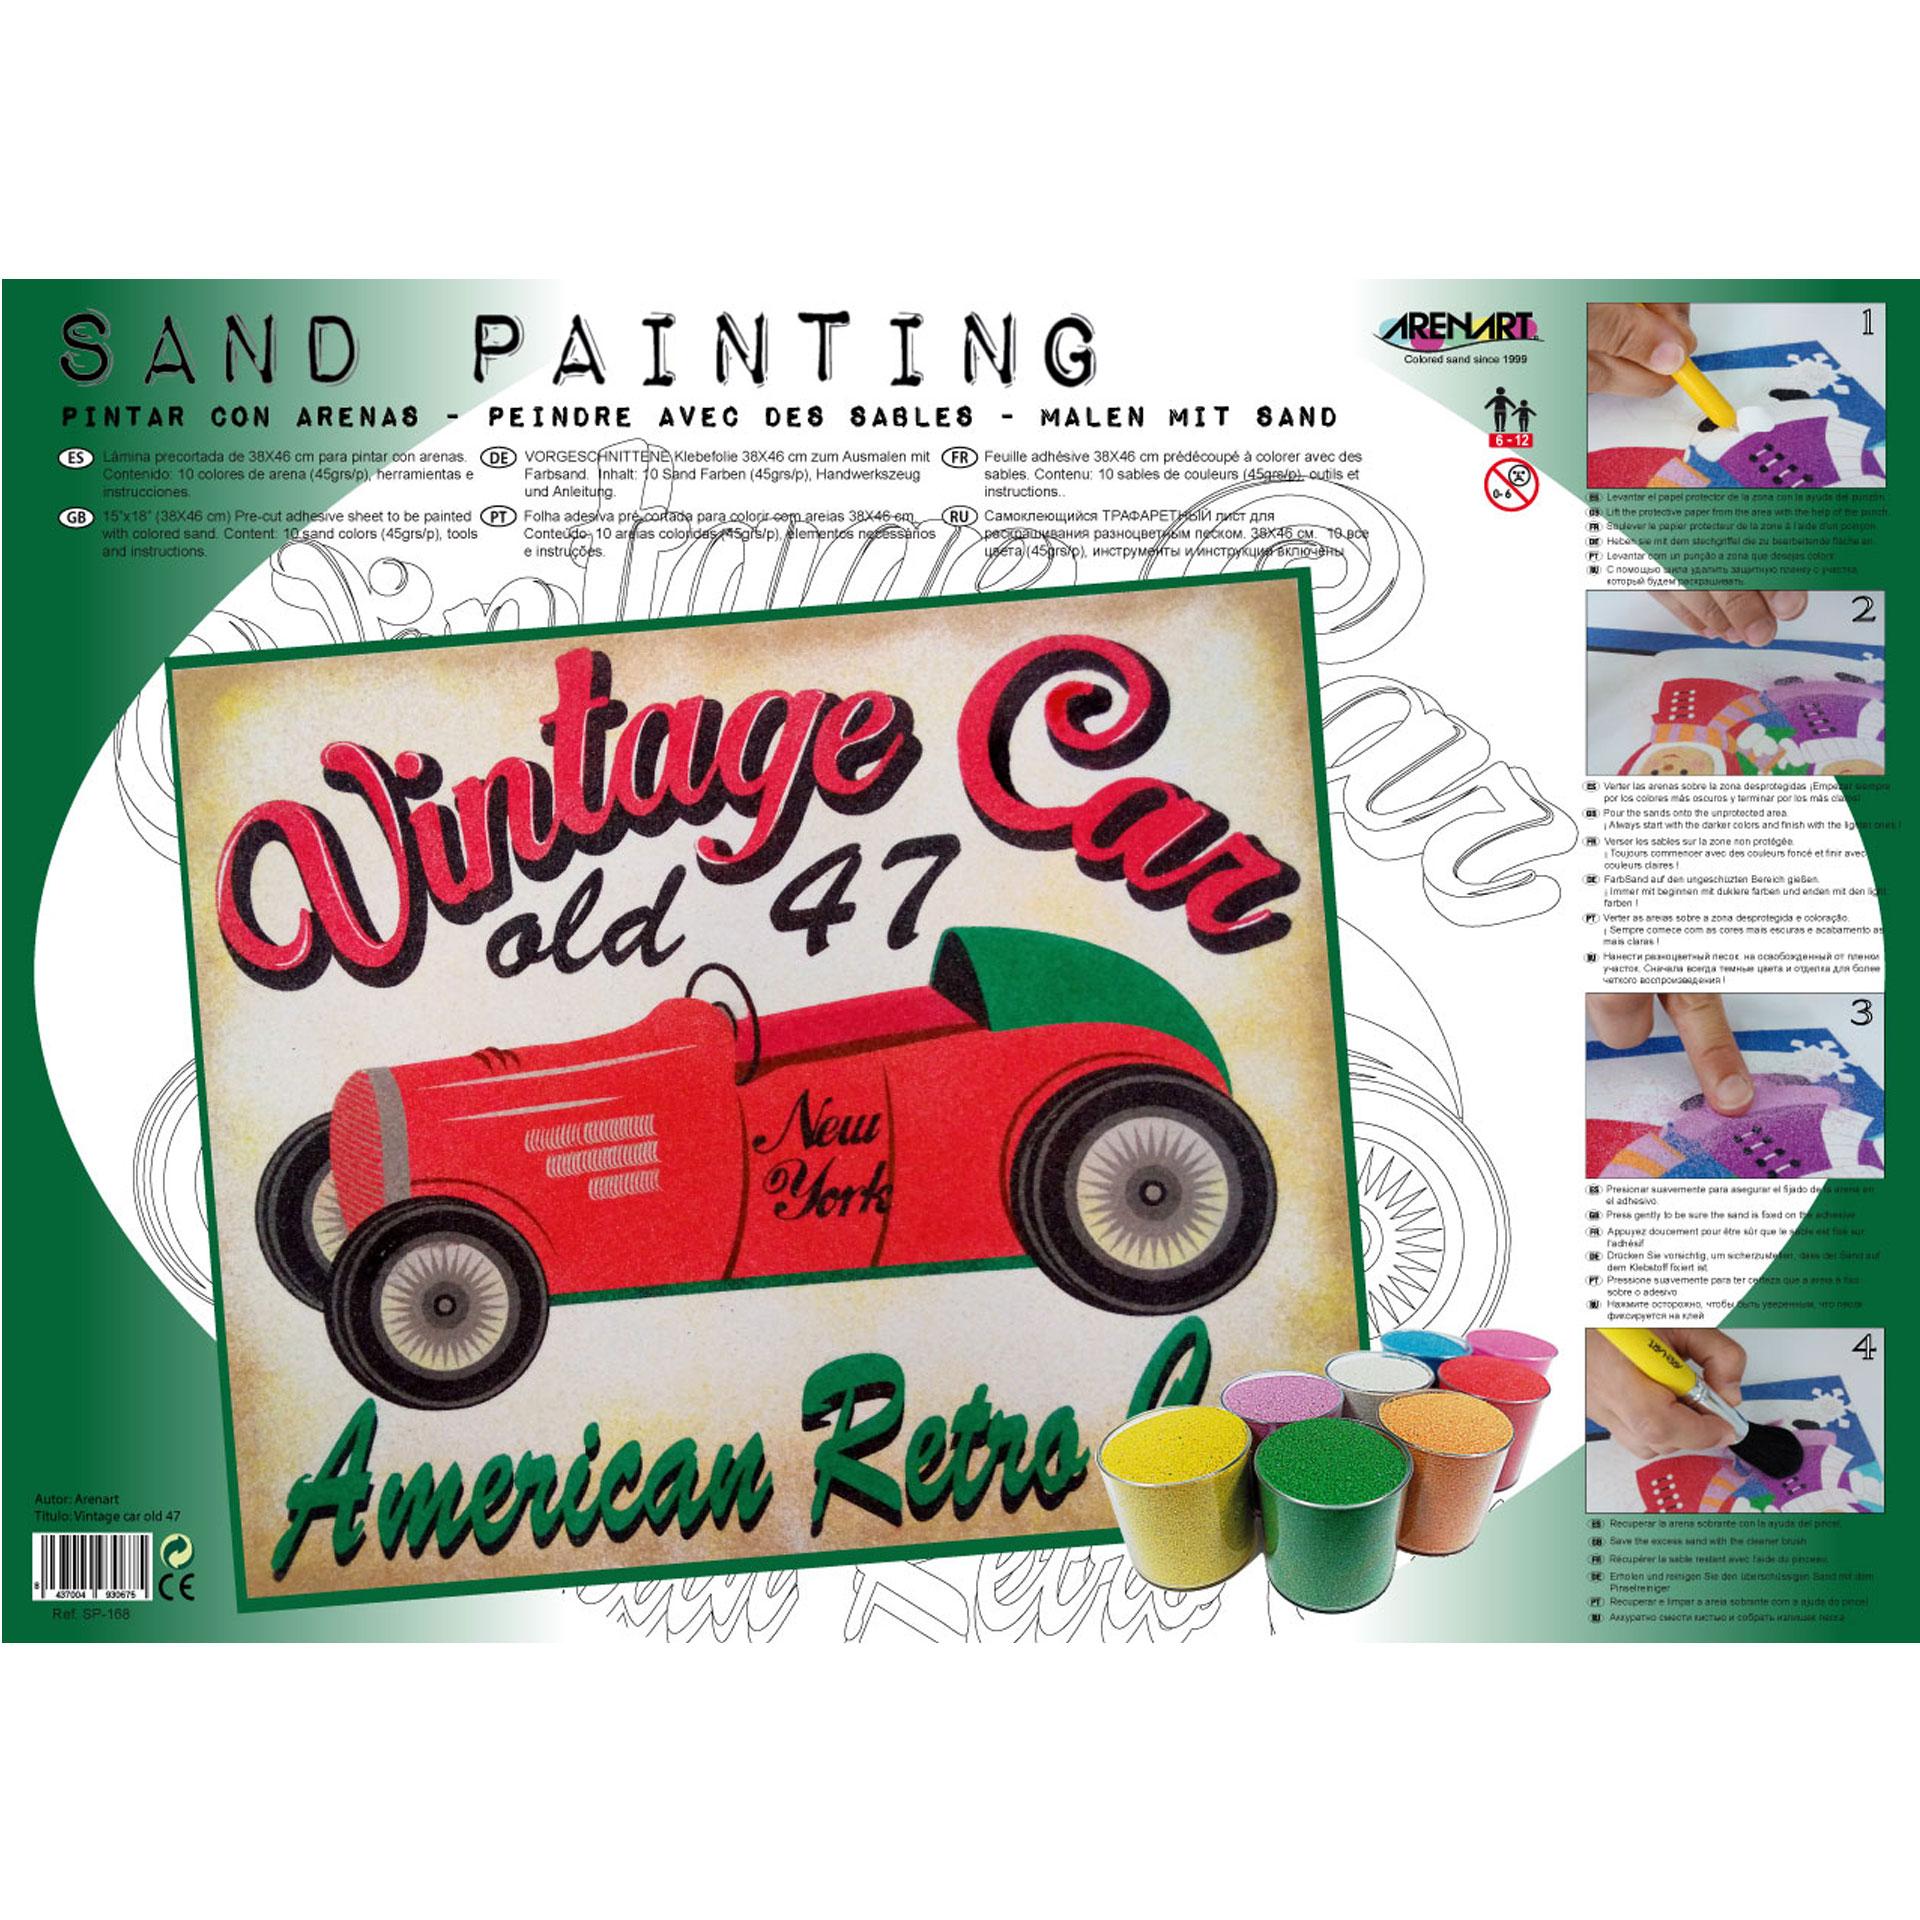 Sand Painting Vintage Car Old 47